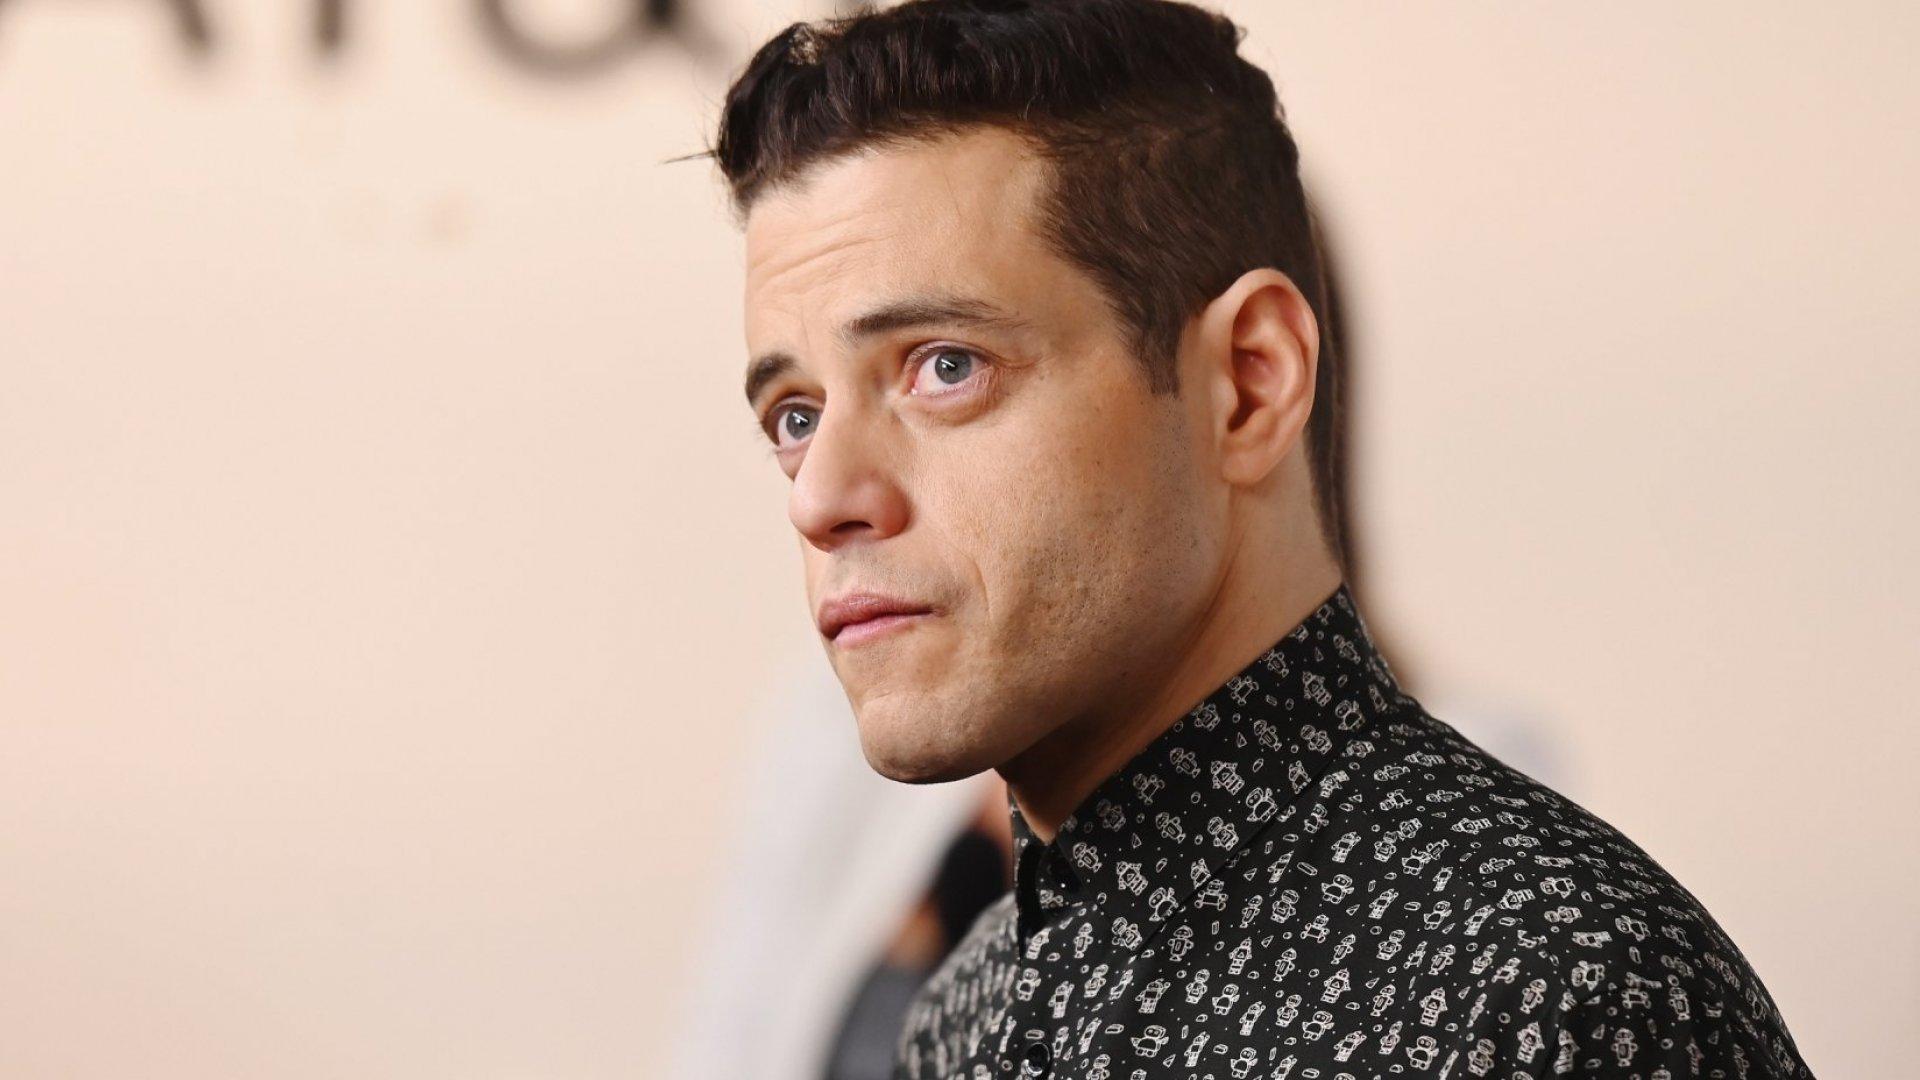 Why Rami Malek's Choice of Self-Talk May Have Led to His Academy Award